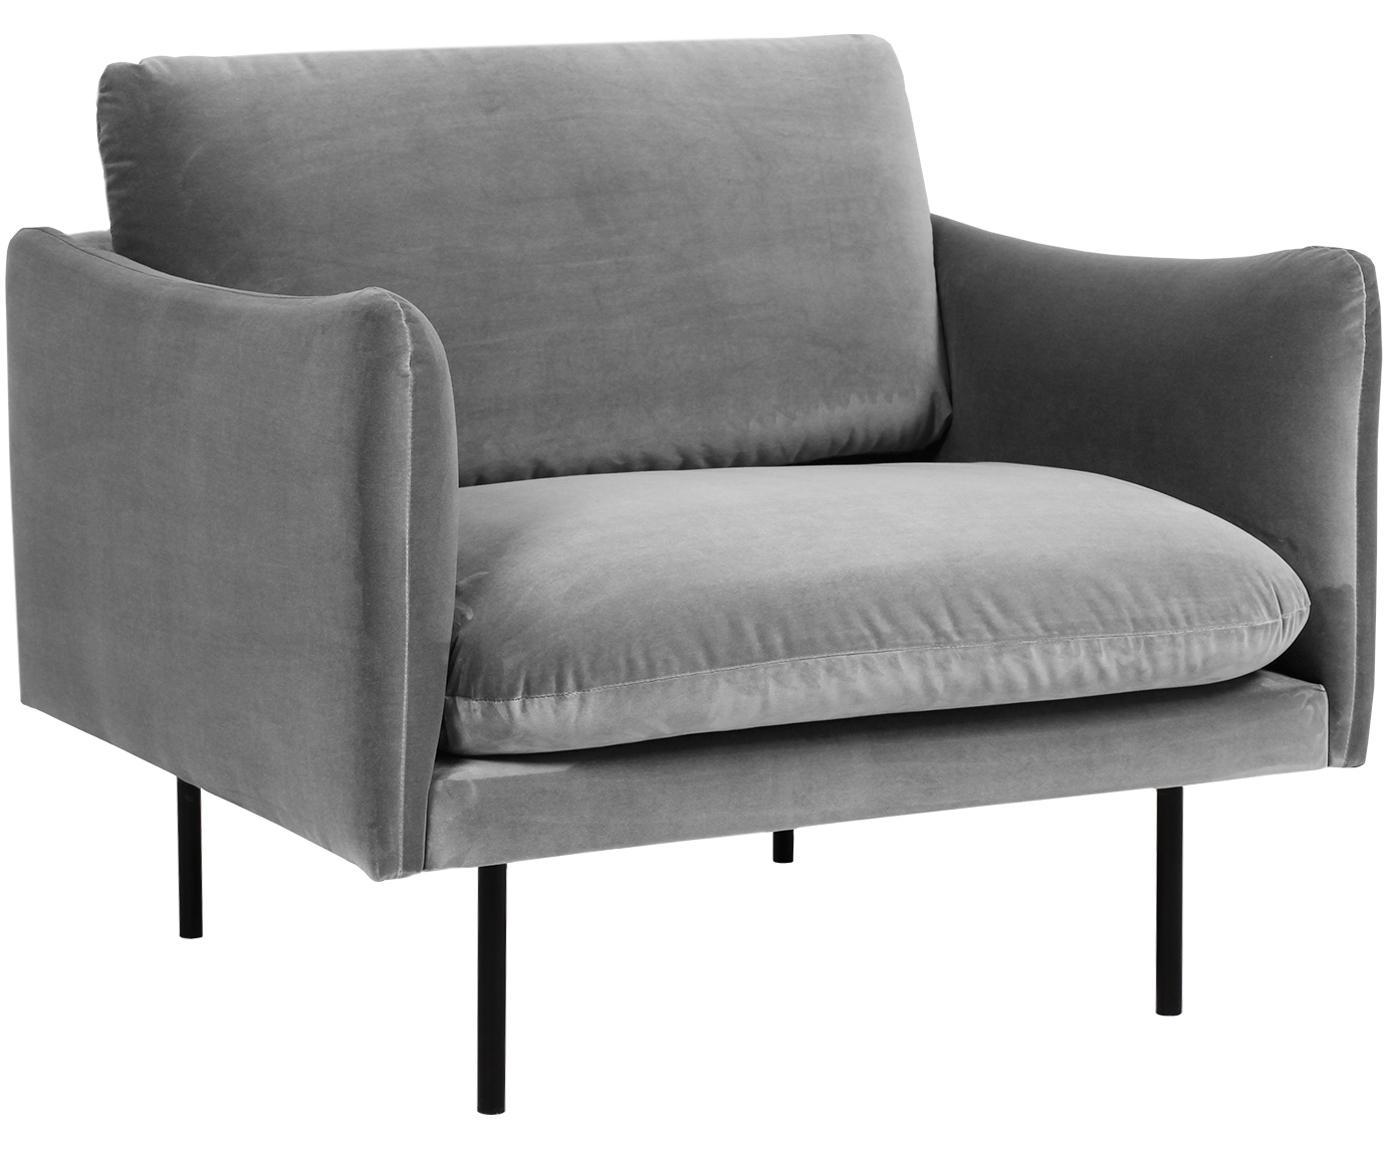 Samt-Sessel Moby, Bezug: Samt (Hochwertiger Polyes, Gestell: Massives Kiefernholz, Füße: Metall, pulverbeschichtet, Samt Grau, B 90 x T 90 cm